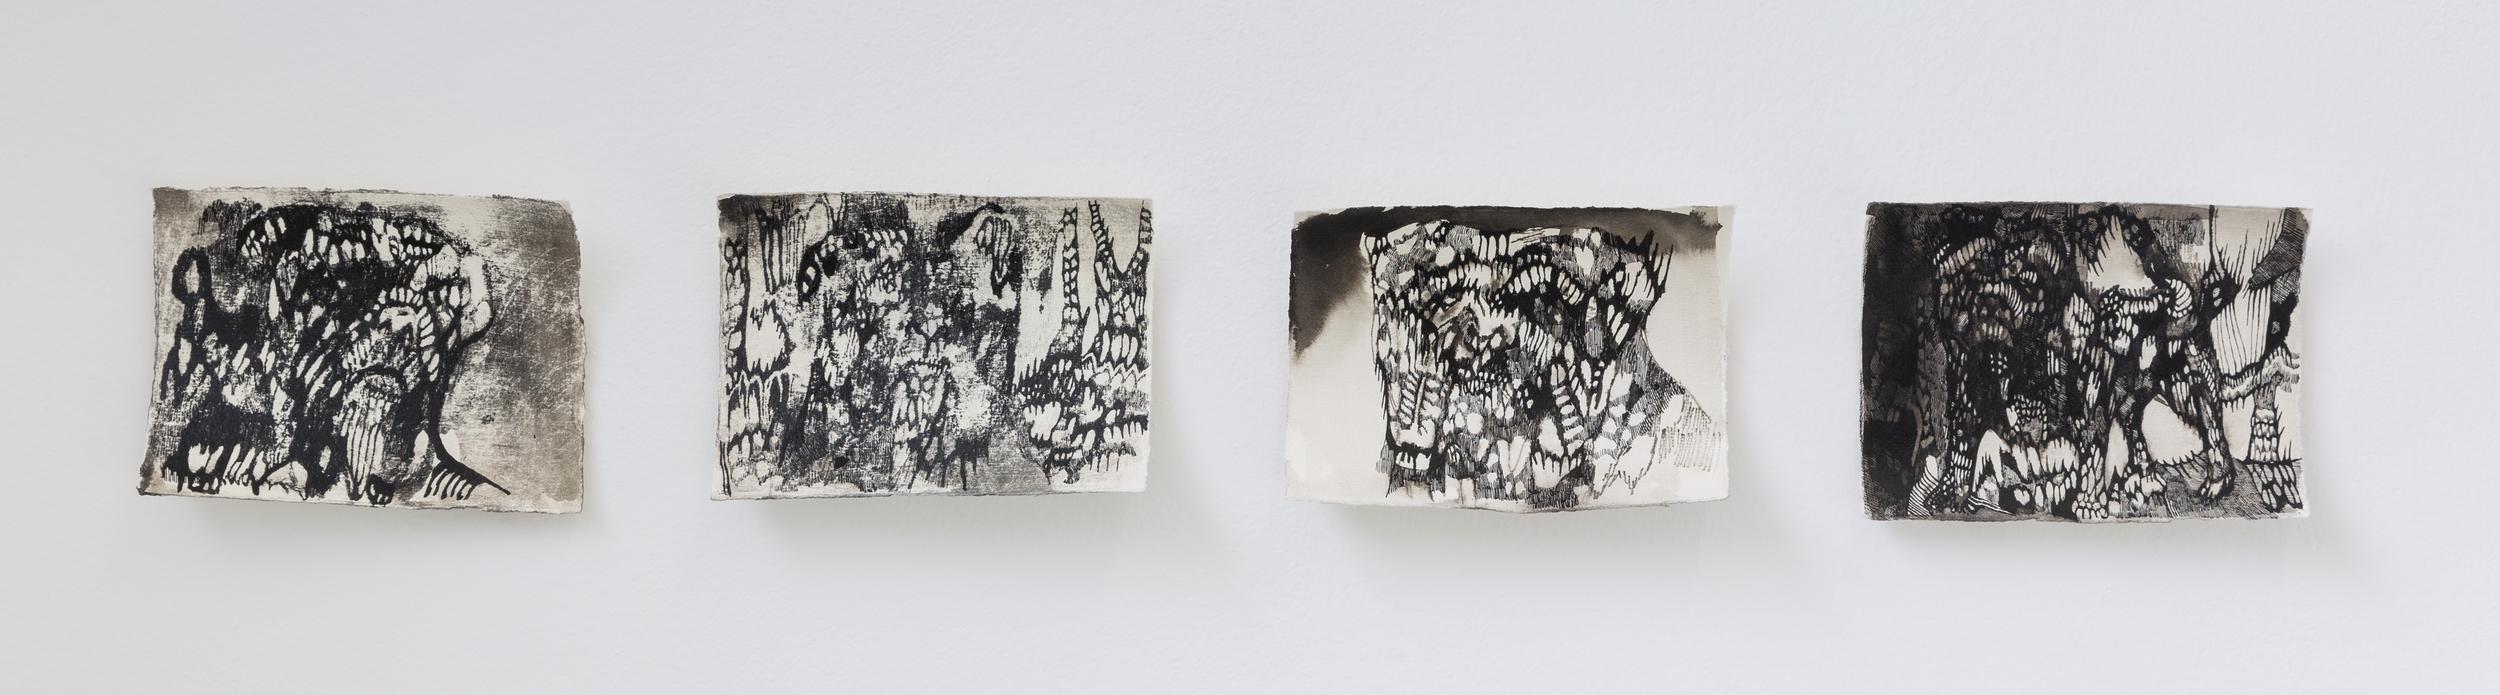 Josef Zlámal, bez názvu, 2015, tuš na ručním papíře, 15 x 19 cm, 4x